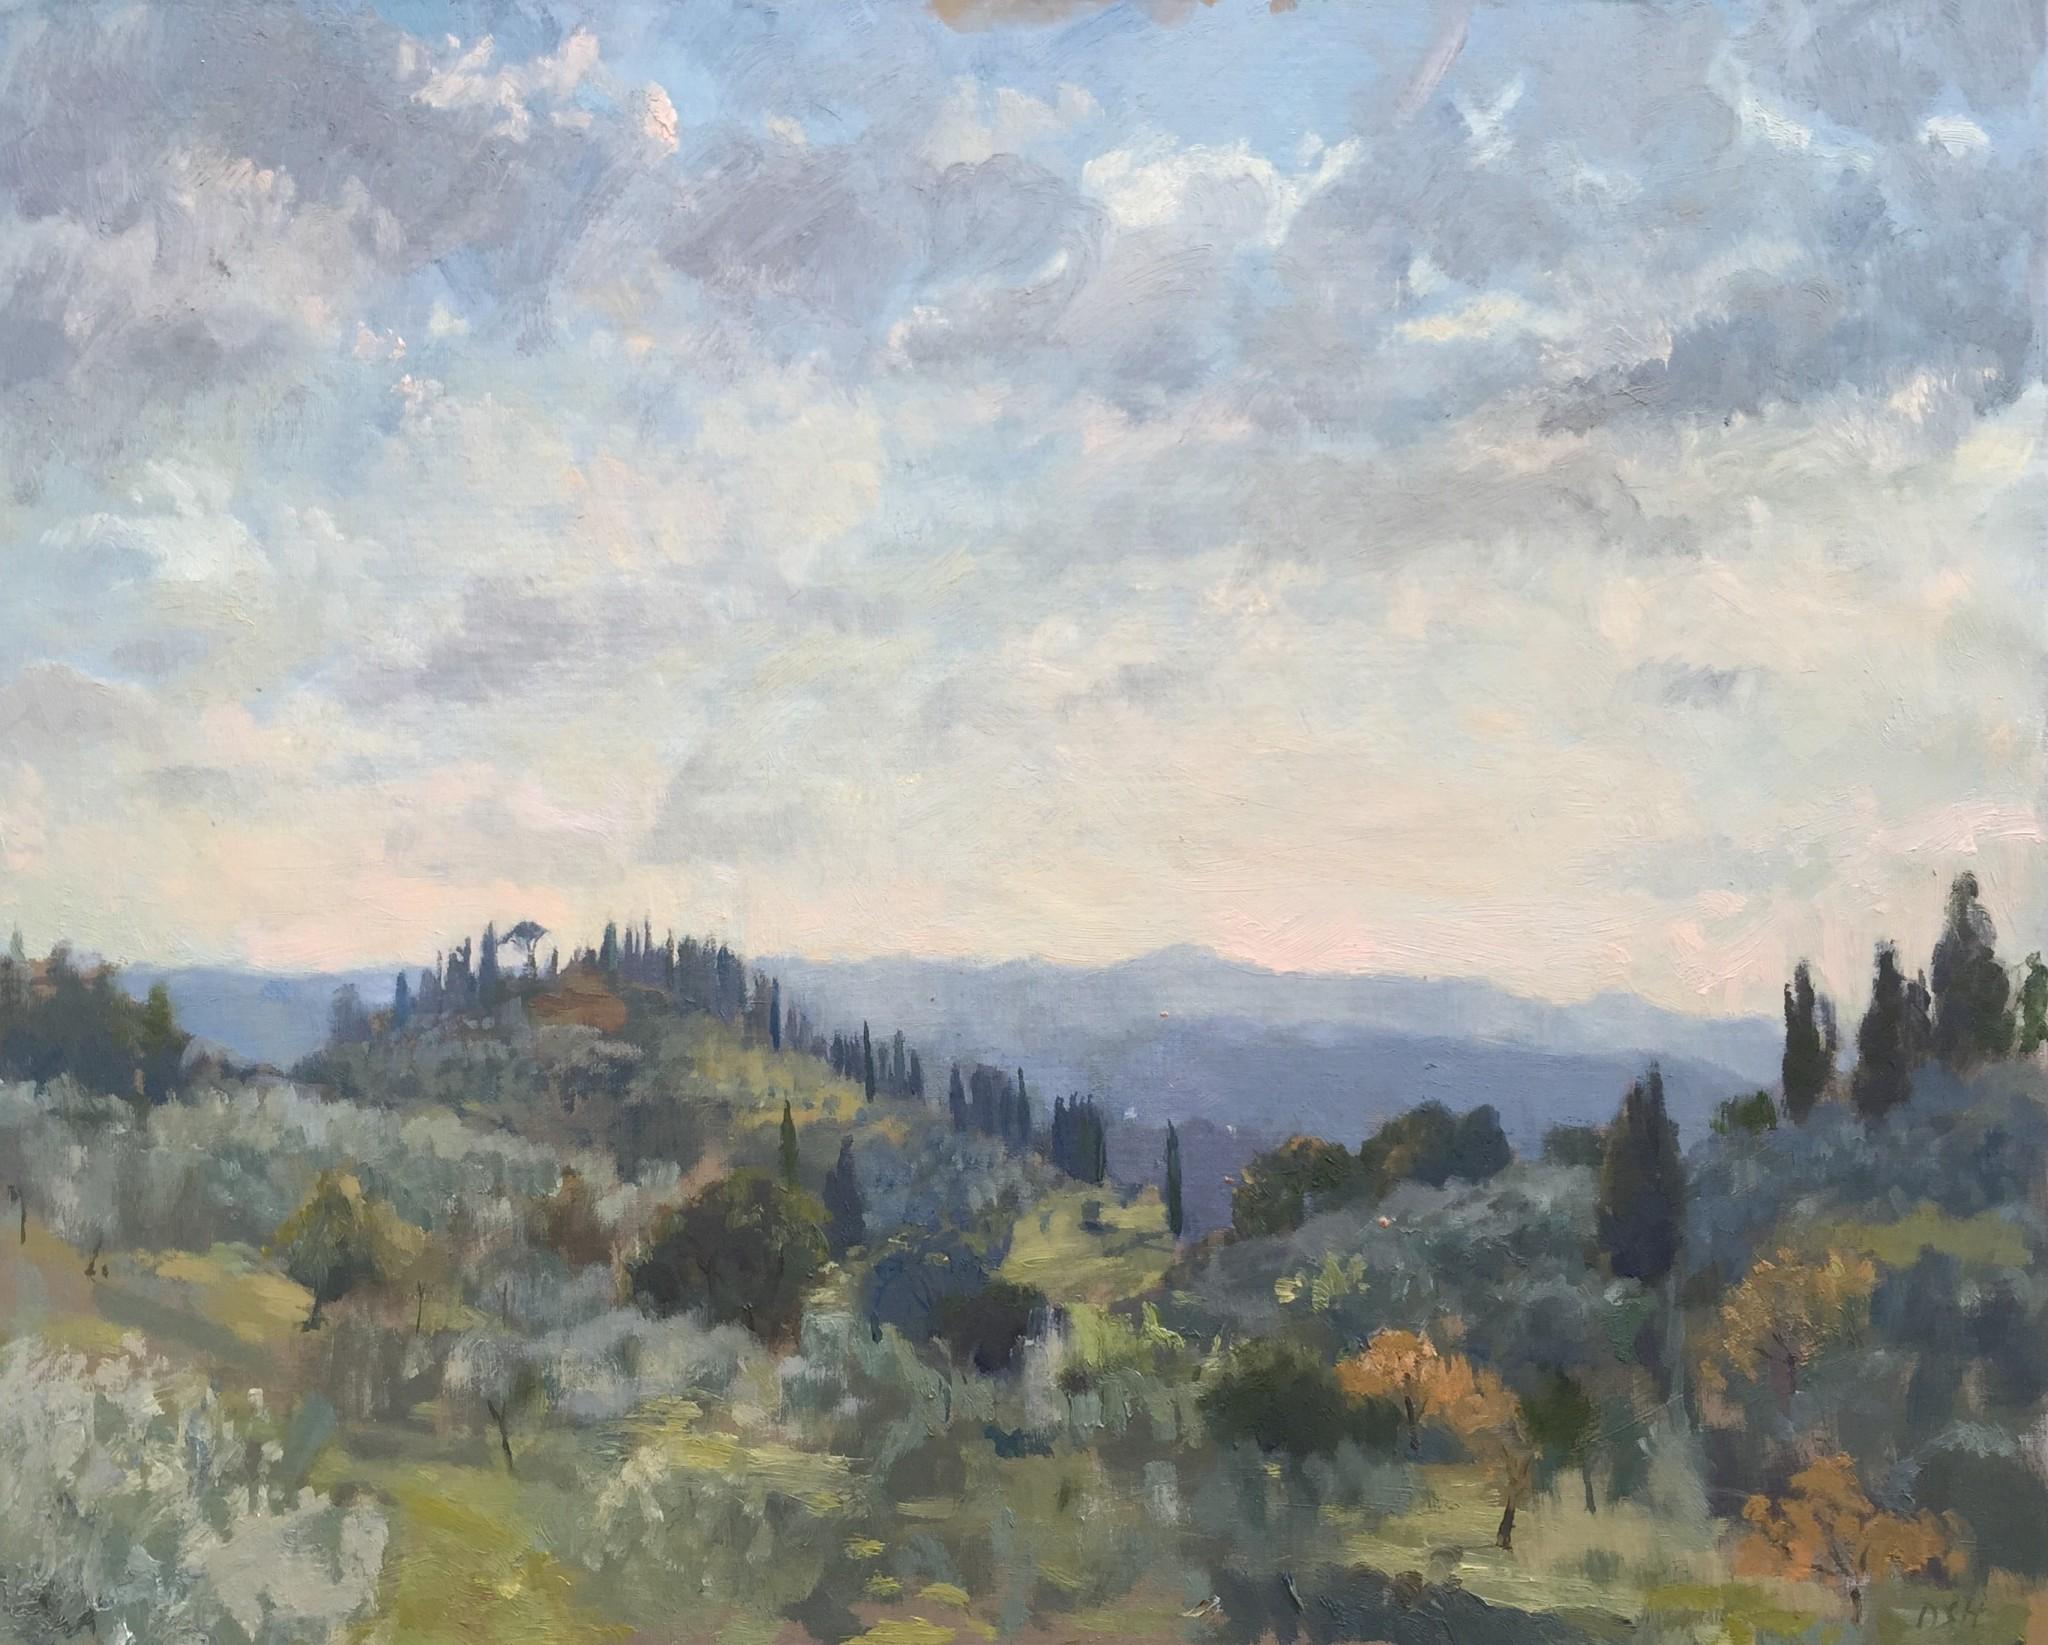 Light on the Olive Trees, Tuscany